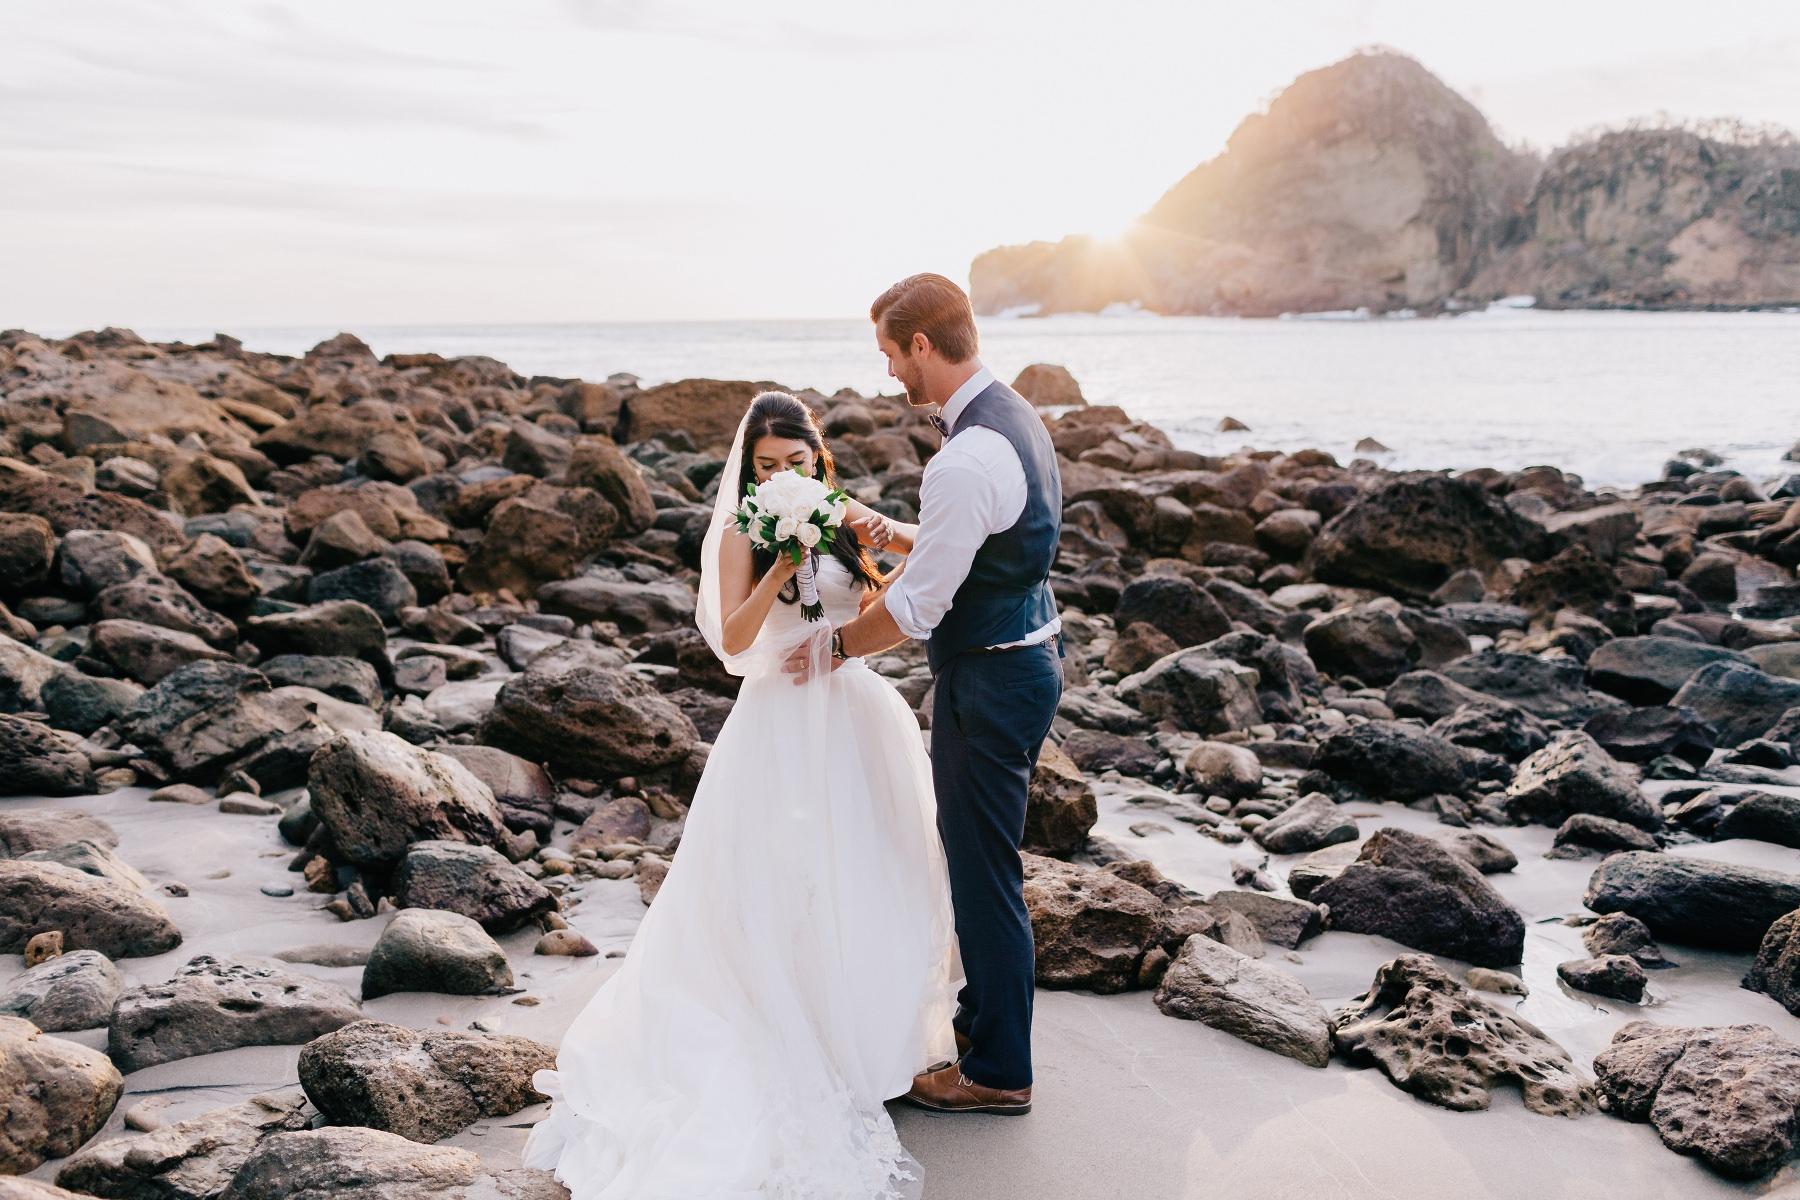 wedding Venue photography - destination wedding Nicaragua